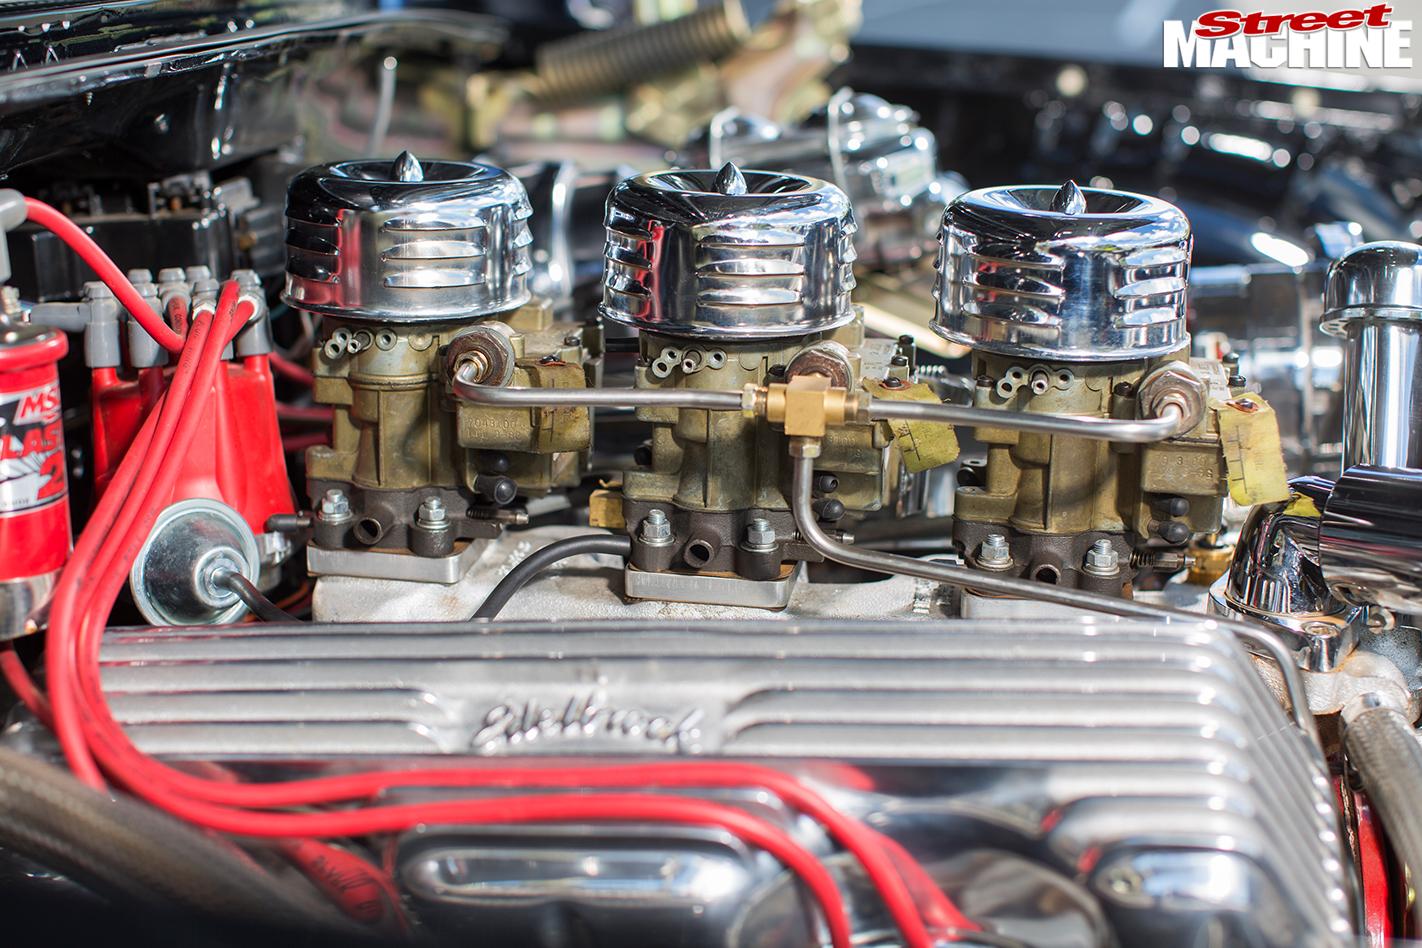 Chevrolet -impala -engine -detail